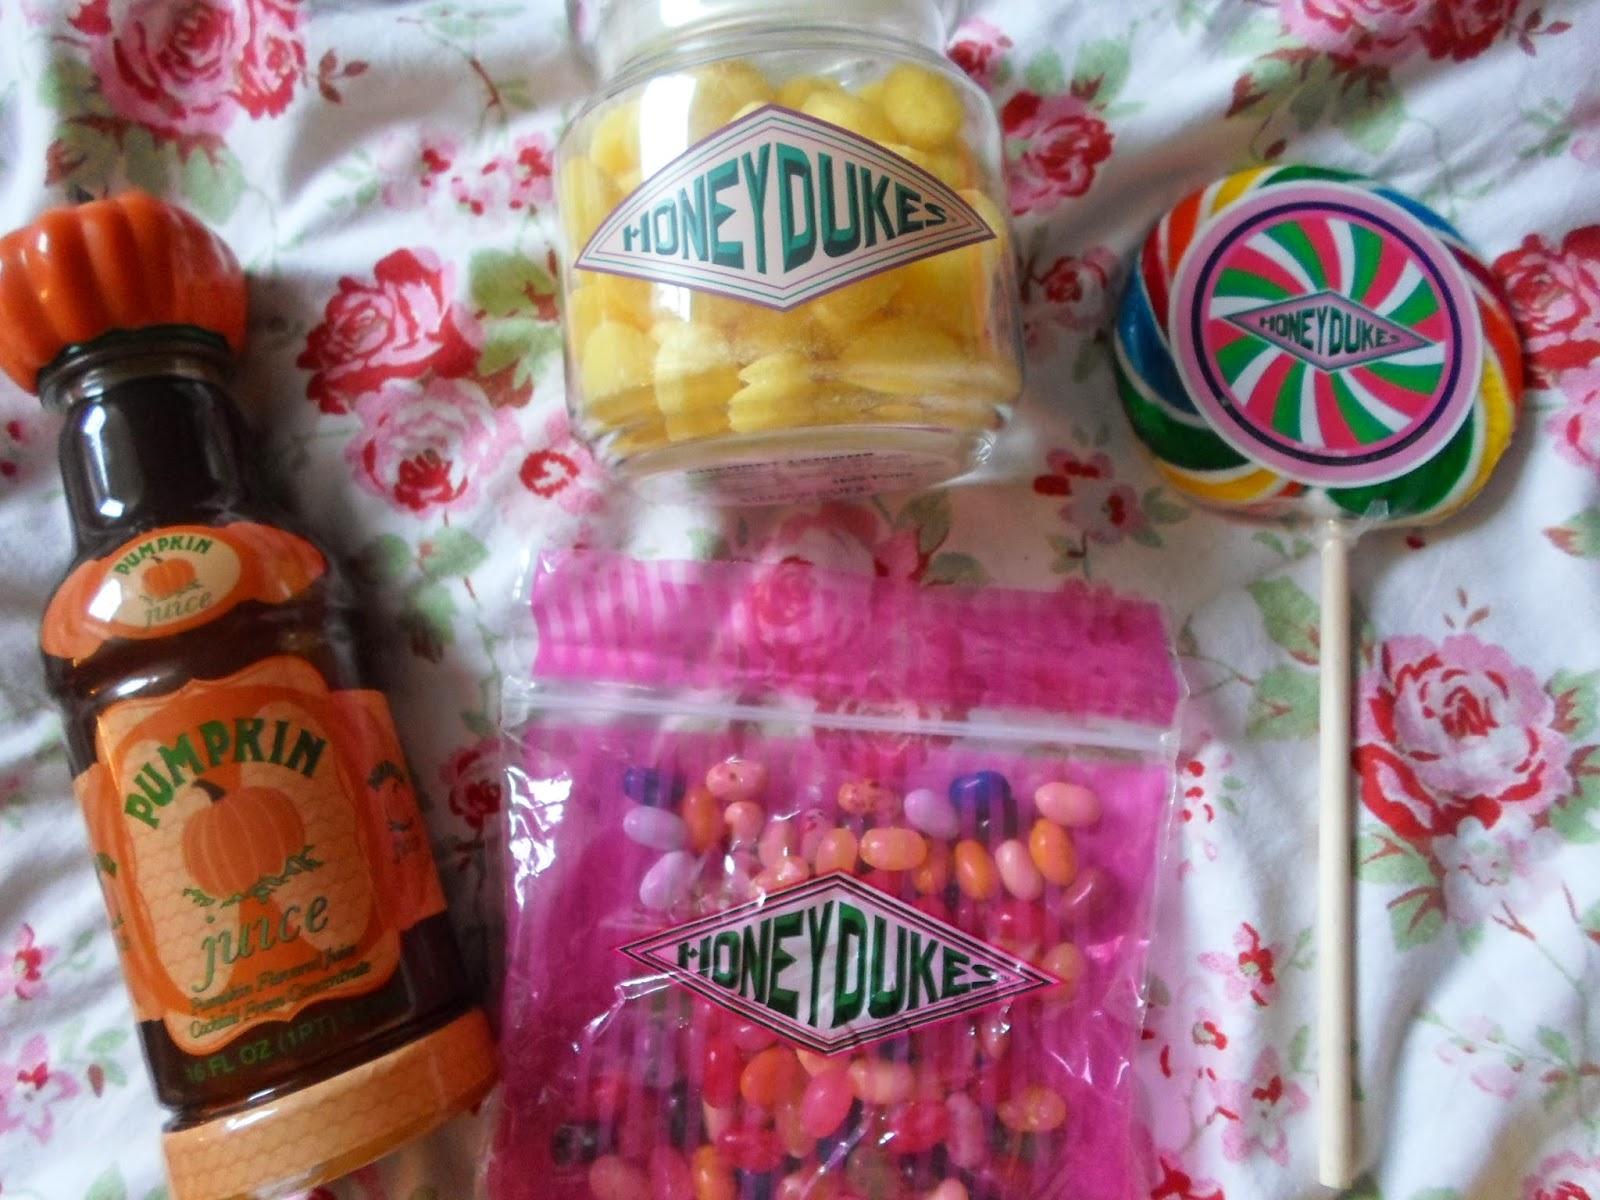 Low Carb Süßigkeiten Rezepte Low Carb Süßigkeiten Kaufen Low